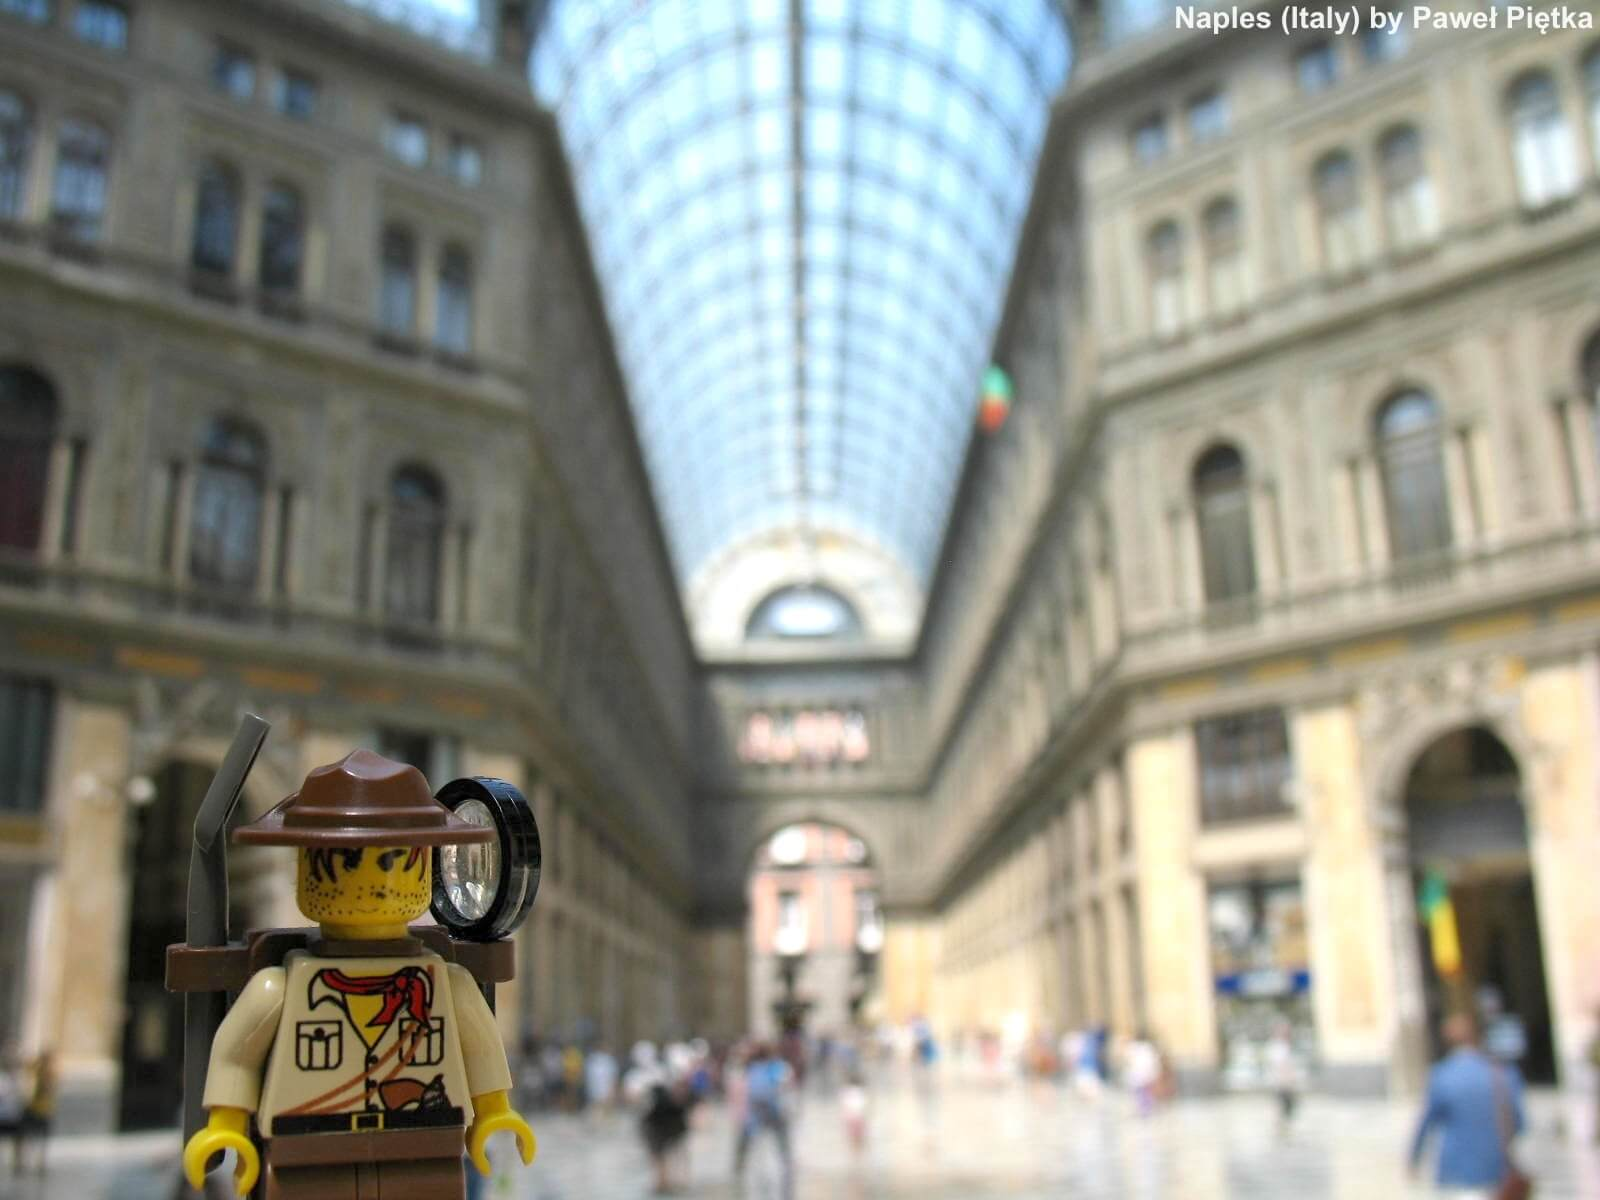 Naples (Italy) - Galleria Umberto I